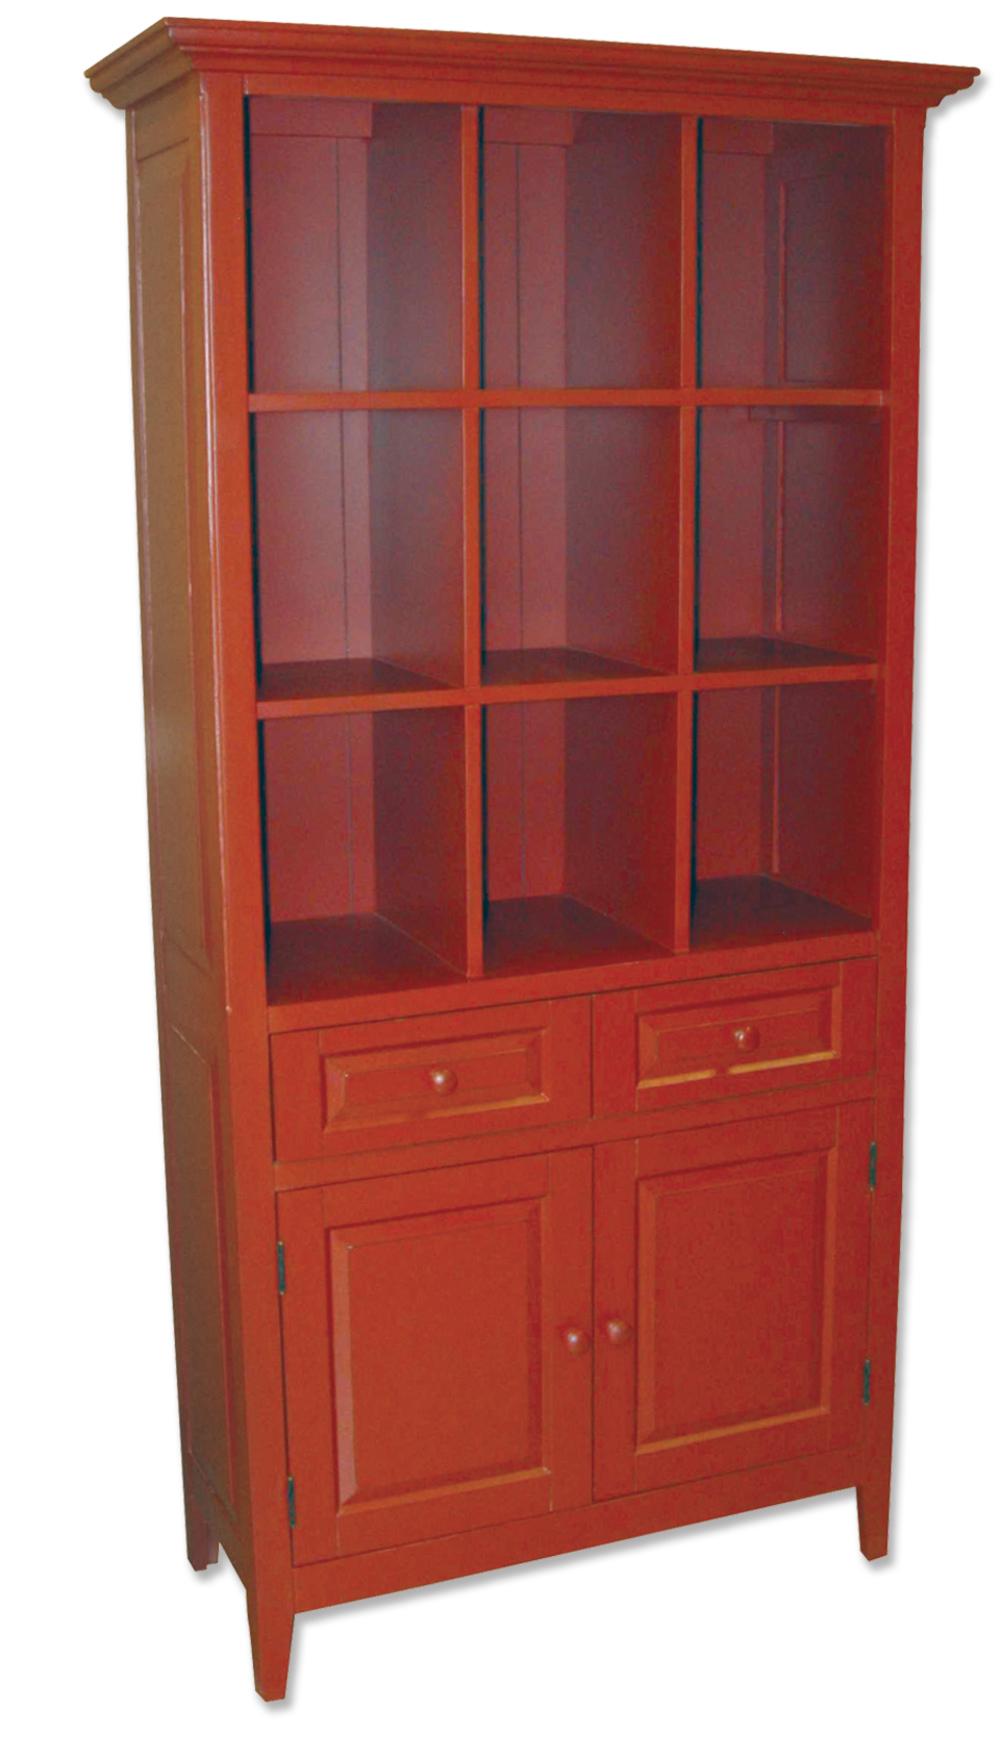 Trade Winds Furniture - Display/Storage Cabinet